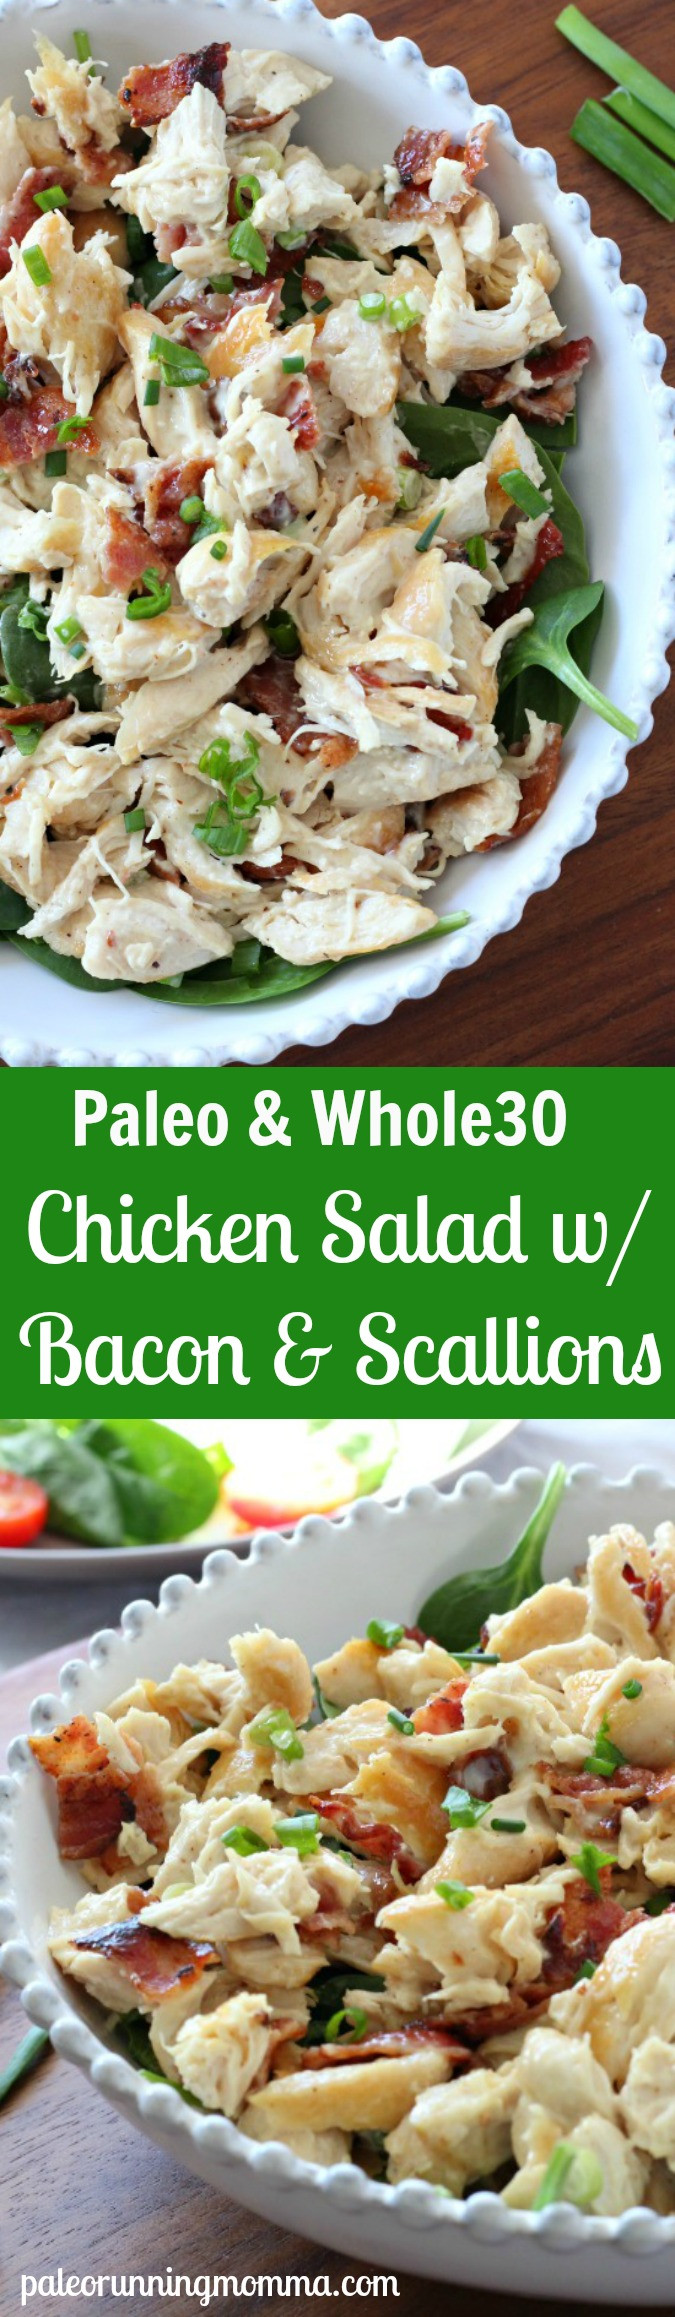 Paleo Chicken Salad  Paleo Chicken Salad with Bacon & Green ion